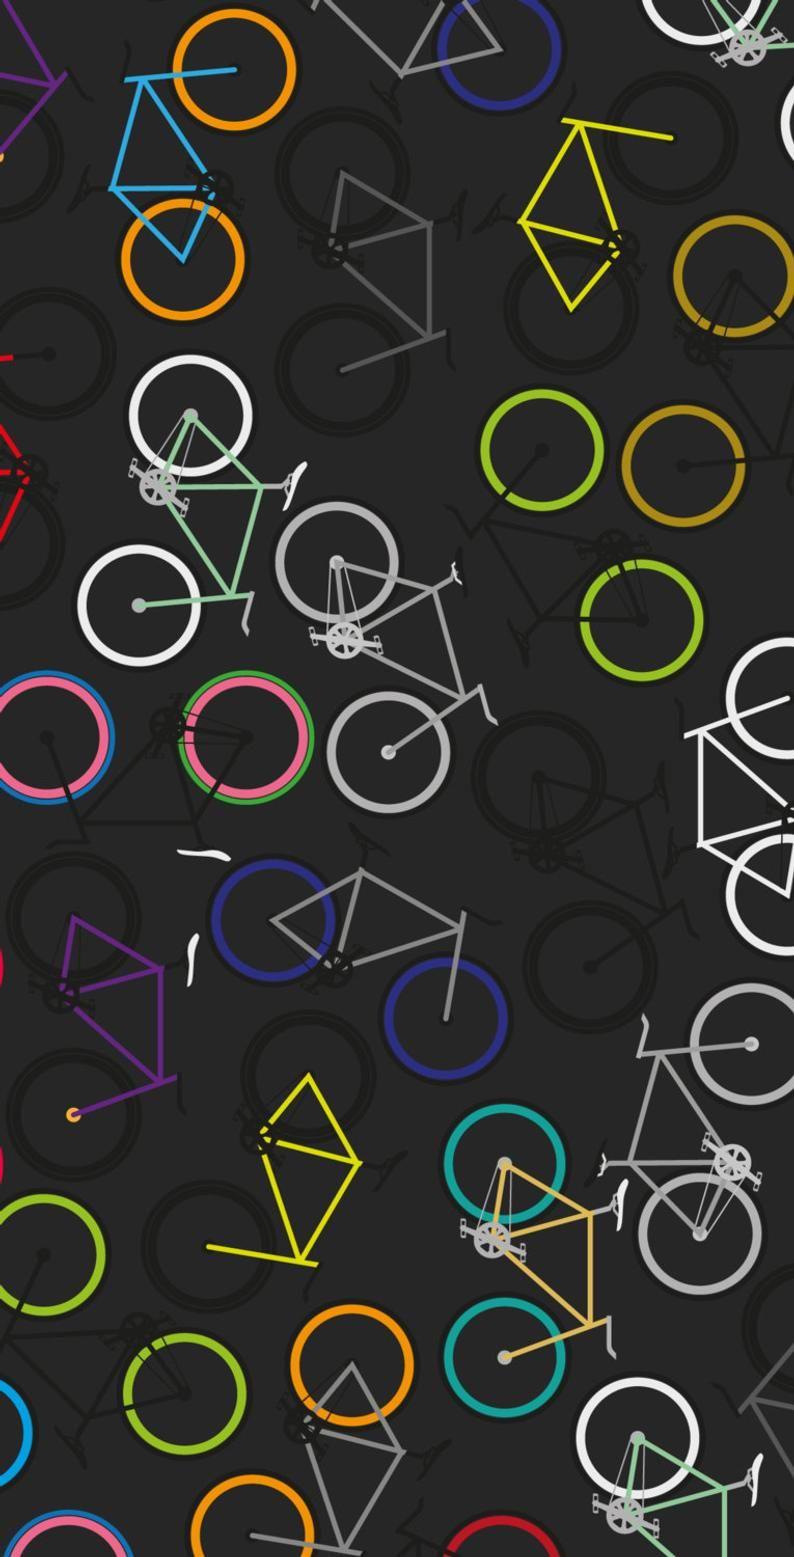 Bikes Themed Cornhole Board Prints / Wraps | Corn Hole Wraps | Bag Toss | Corn Toss | Custom